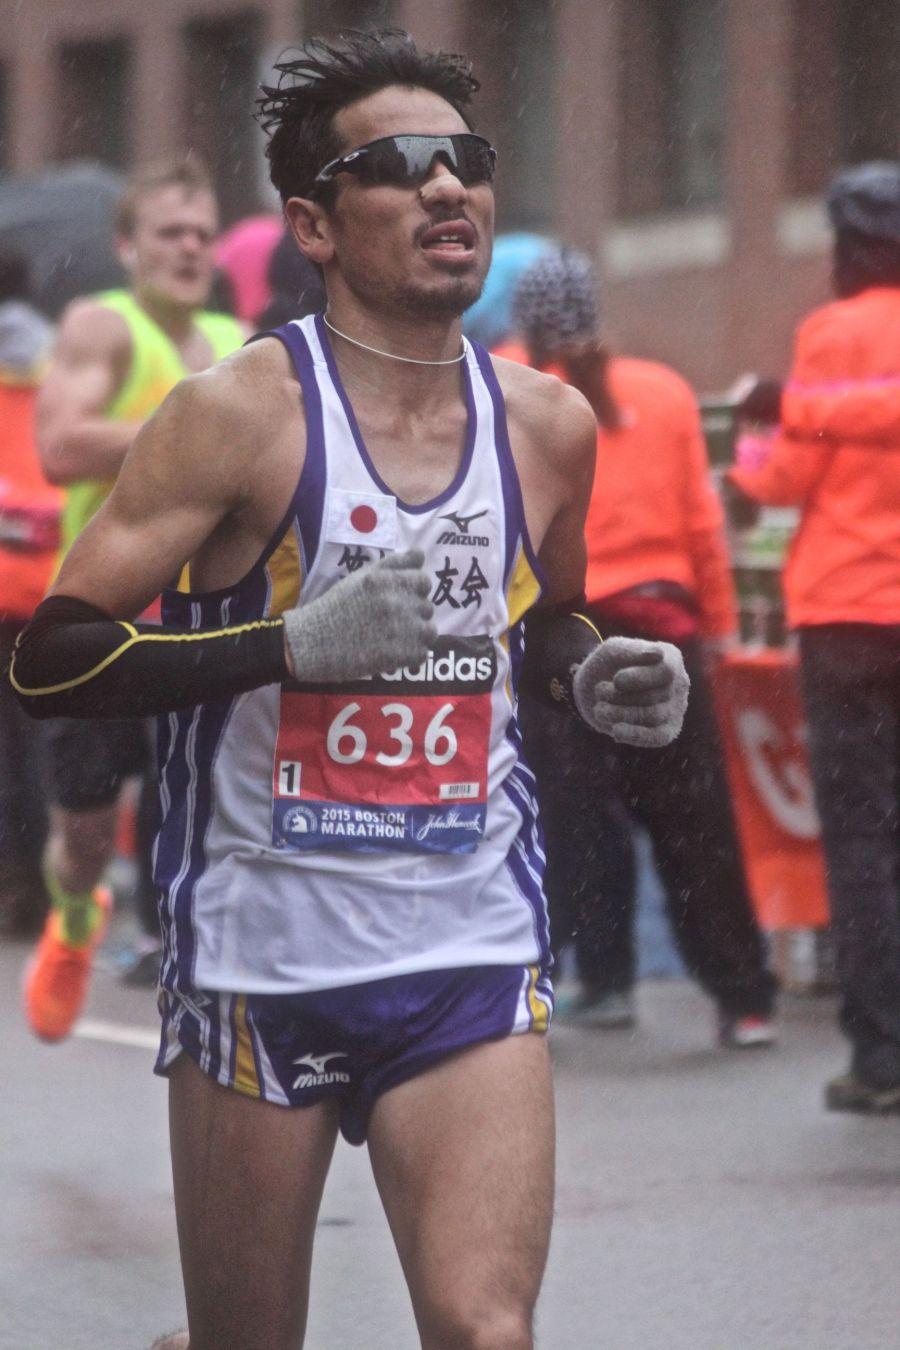 boston marathon april 20 2015 racer number 636